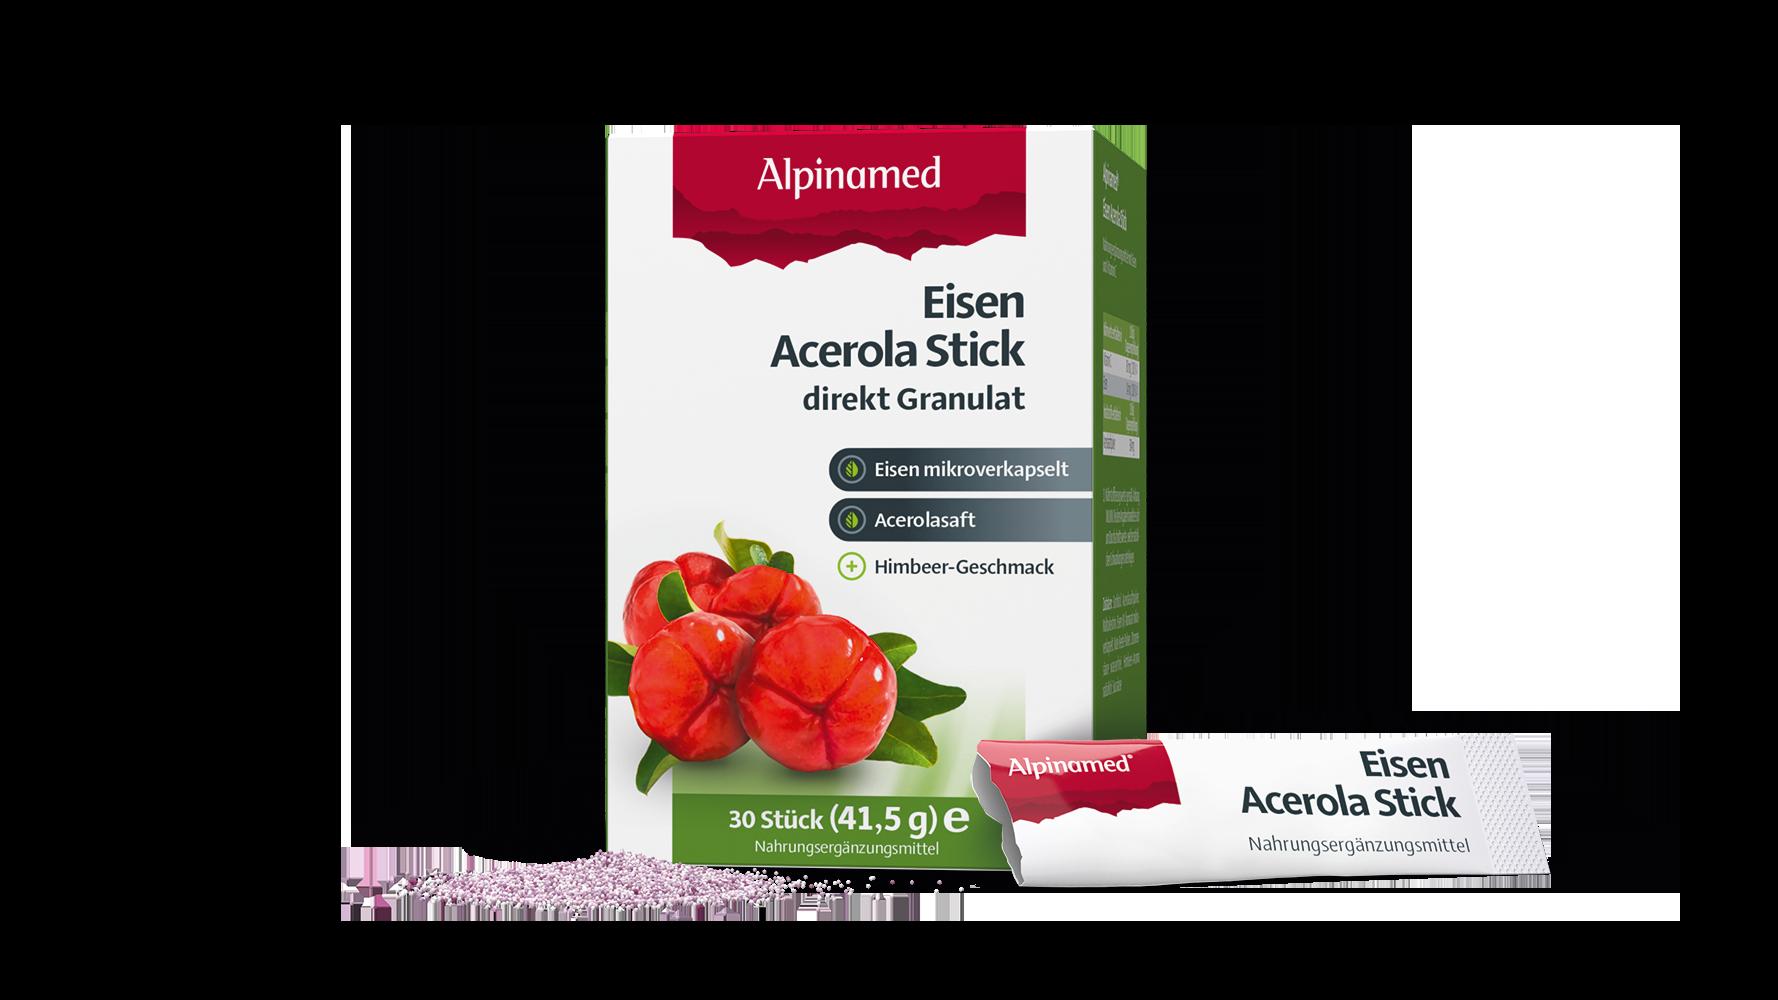 Alpinamed® Eisen Acerola Stick